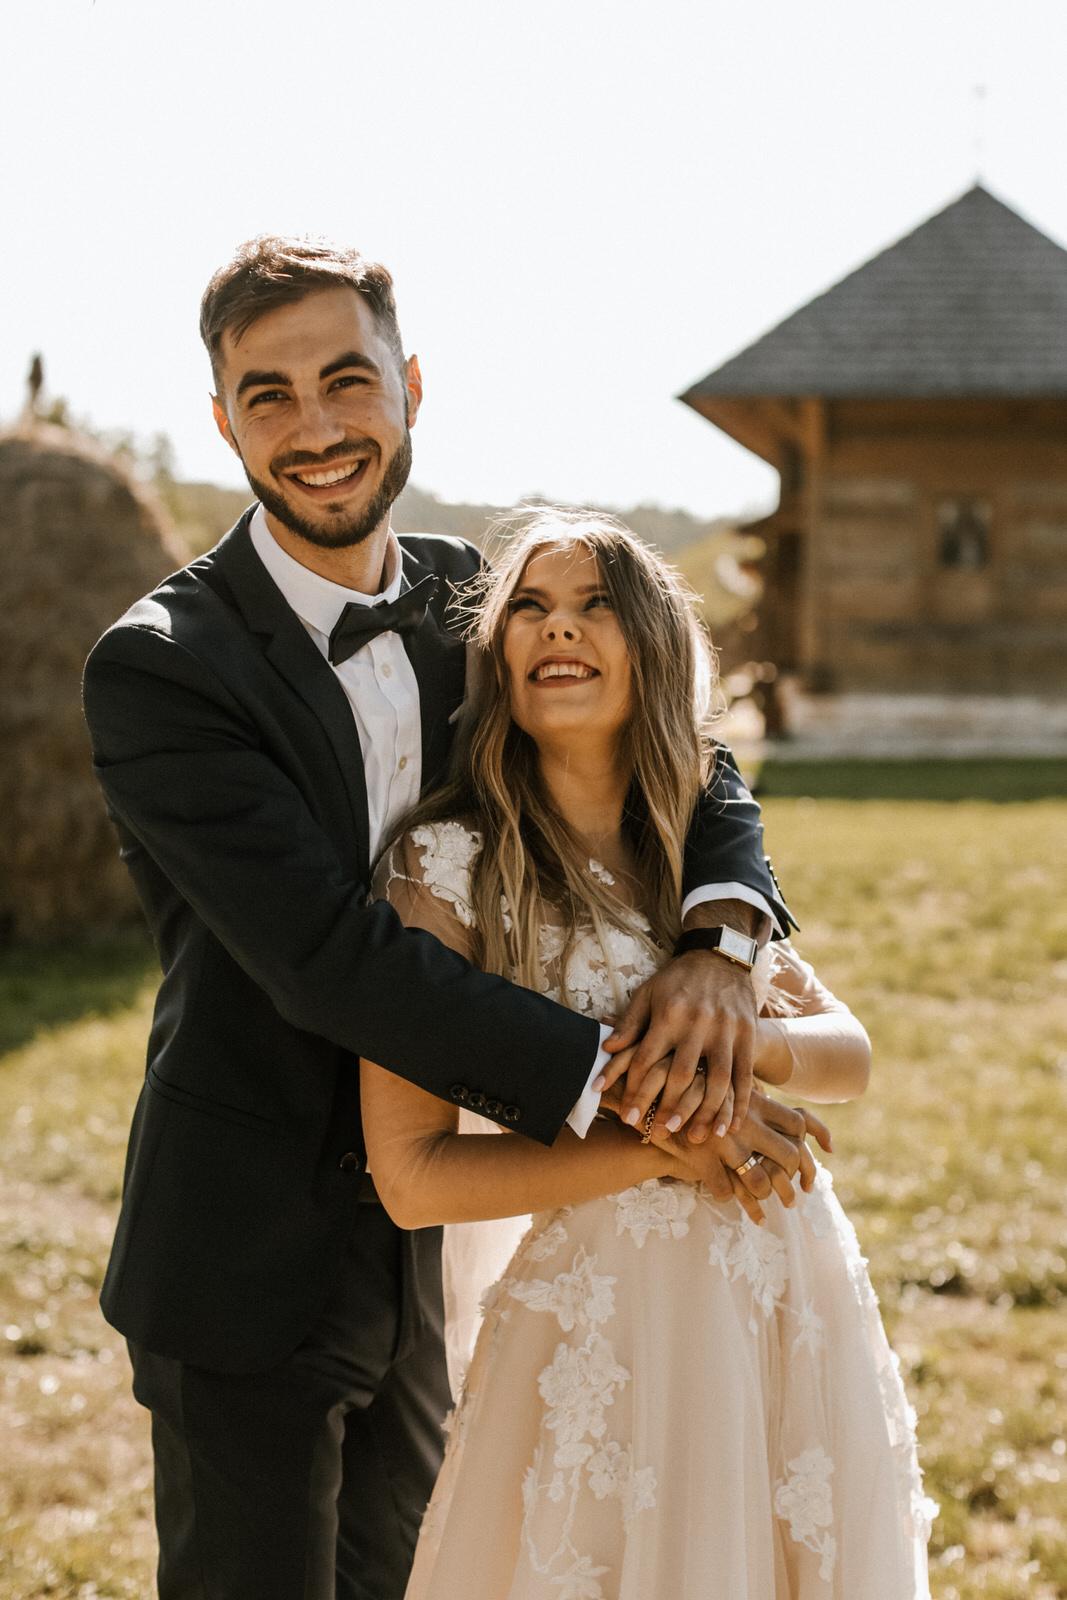 Anya & Ticu - wedding / chisinau, moldova